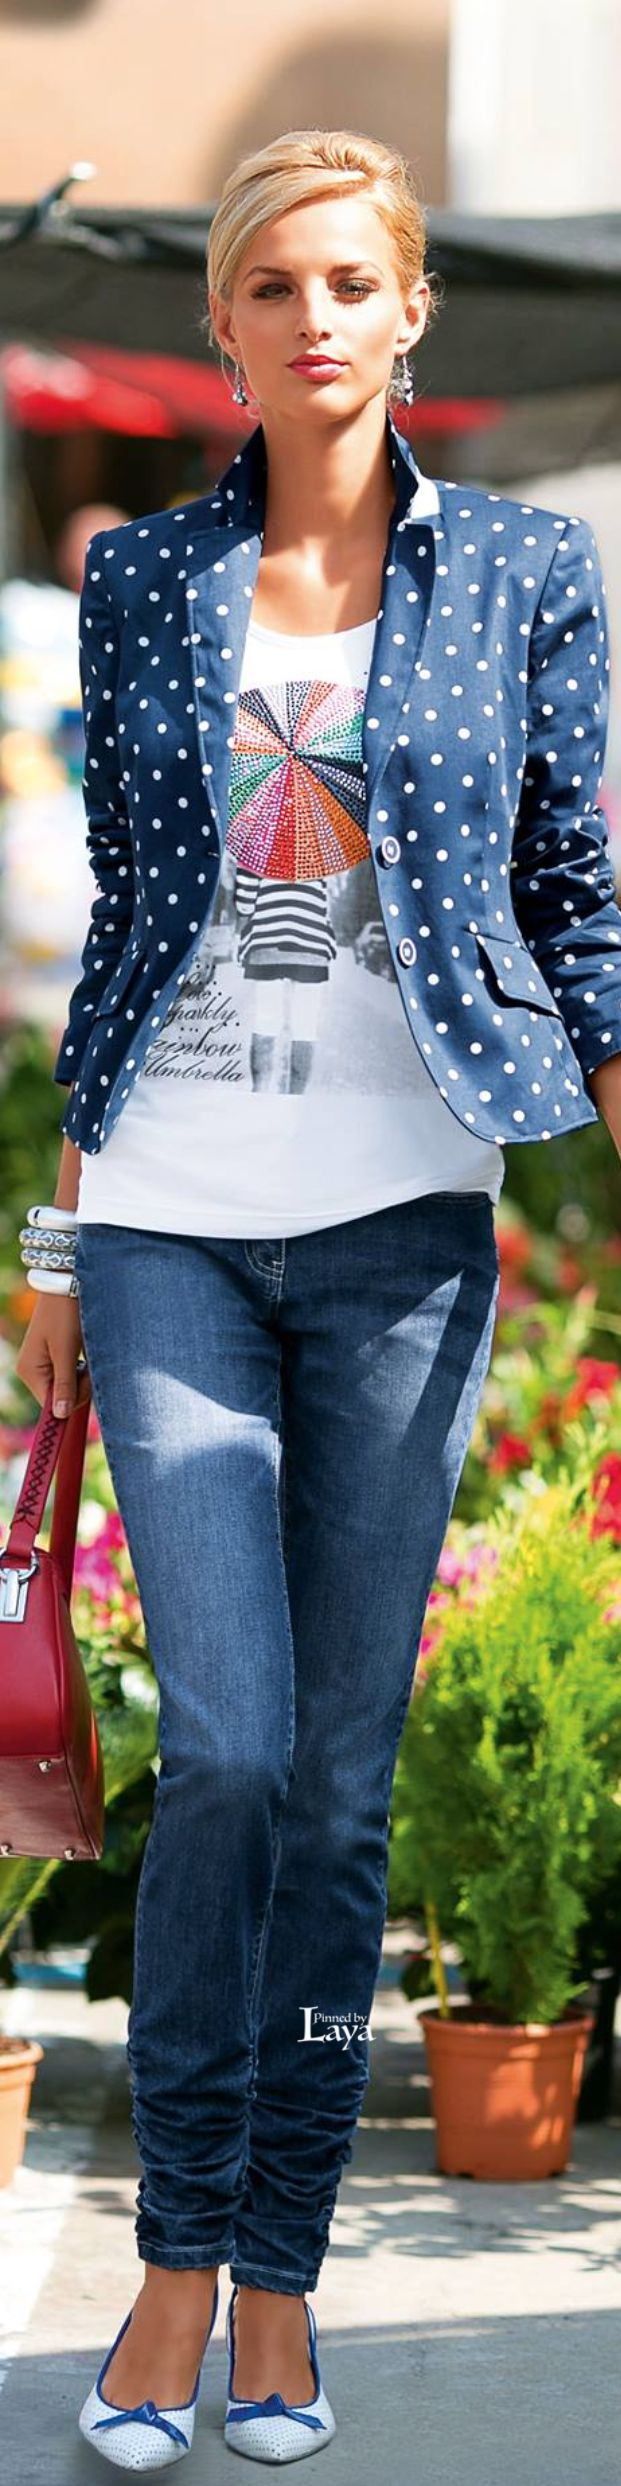 Shop Shabby Shack Vintage Denim in Courtyard Antiques in the Mason Antiques District. Denim for Women & Children. Courtyard Antiques. Shabby Shack Vintage Denim, retro treasures & more! Open 7 days ~ 10 - 6 p.m. 208 Mason Street Mason, MI 48854 (517) 676-6388